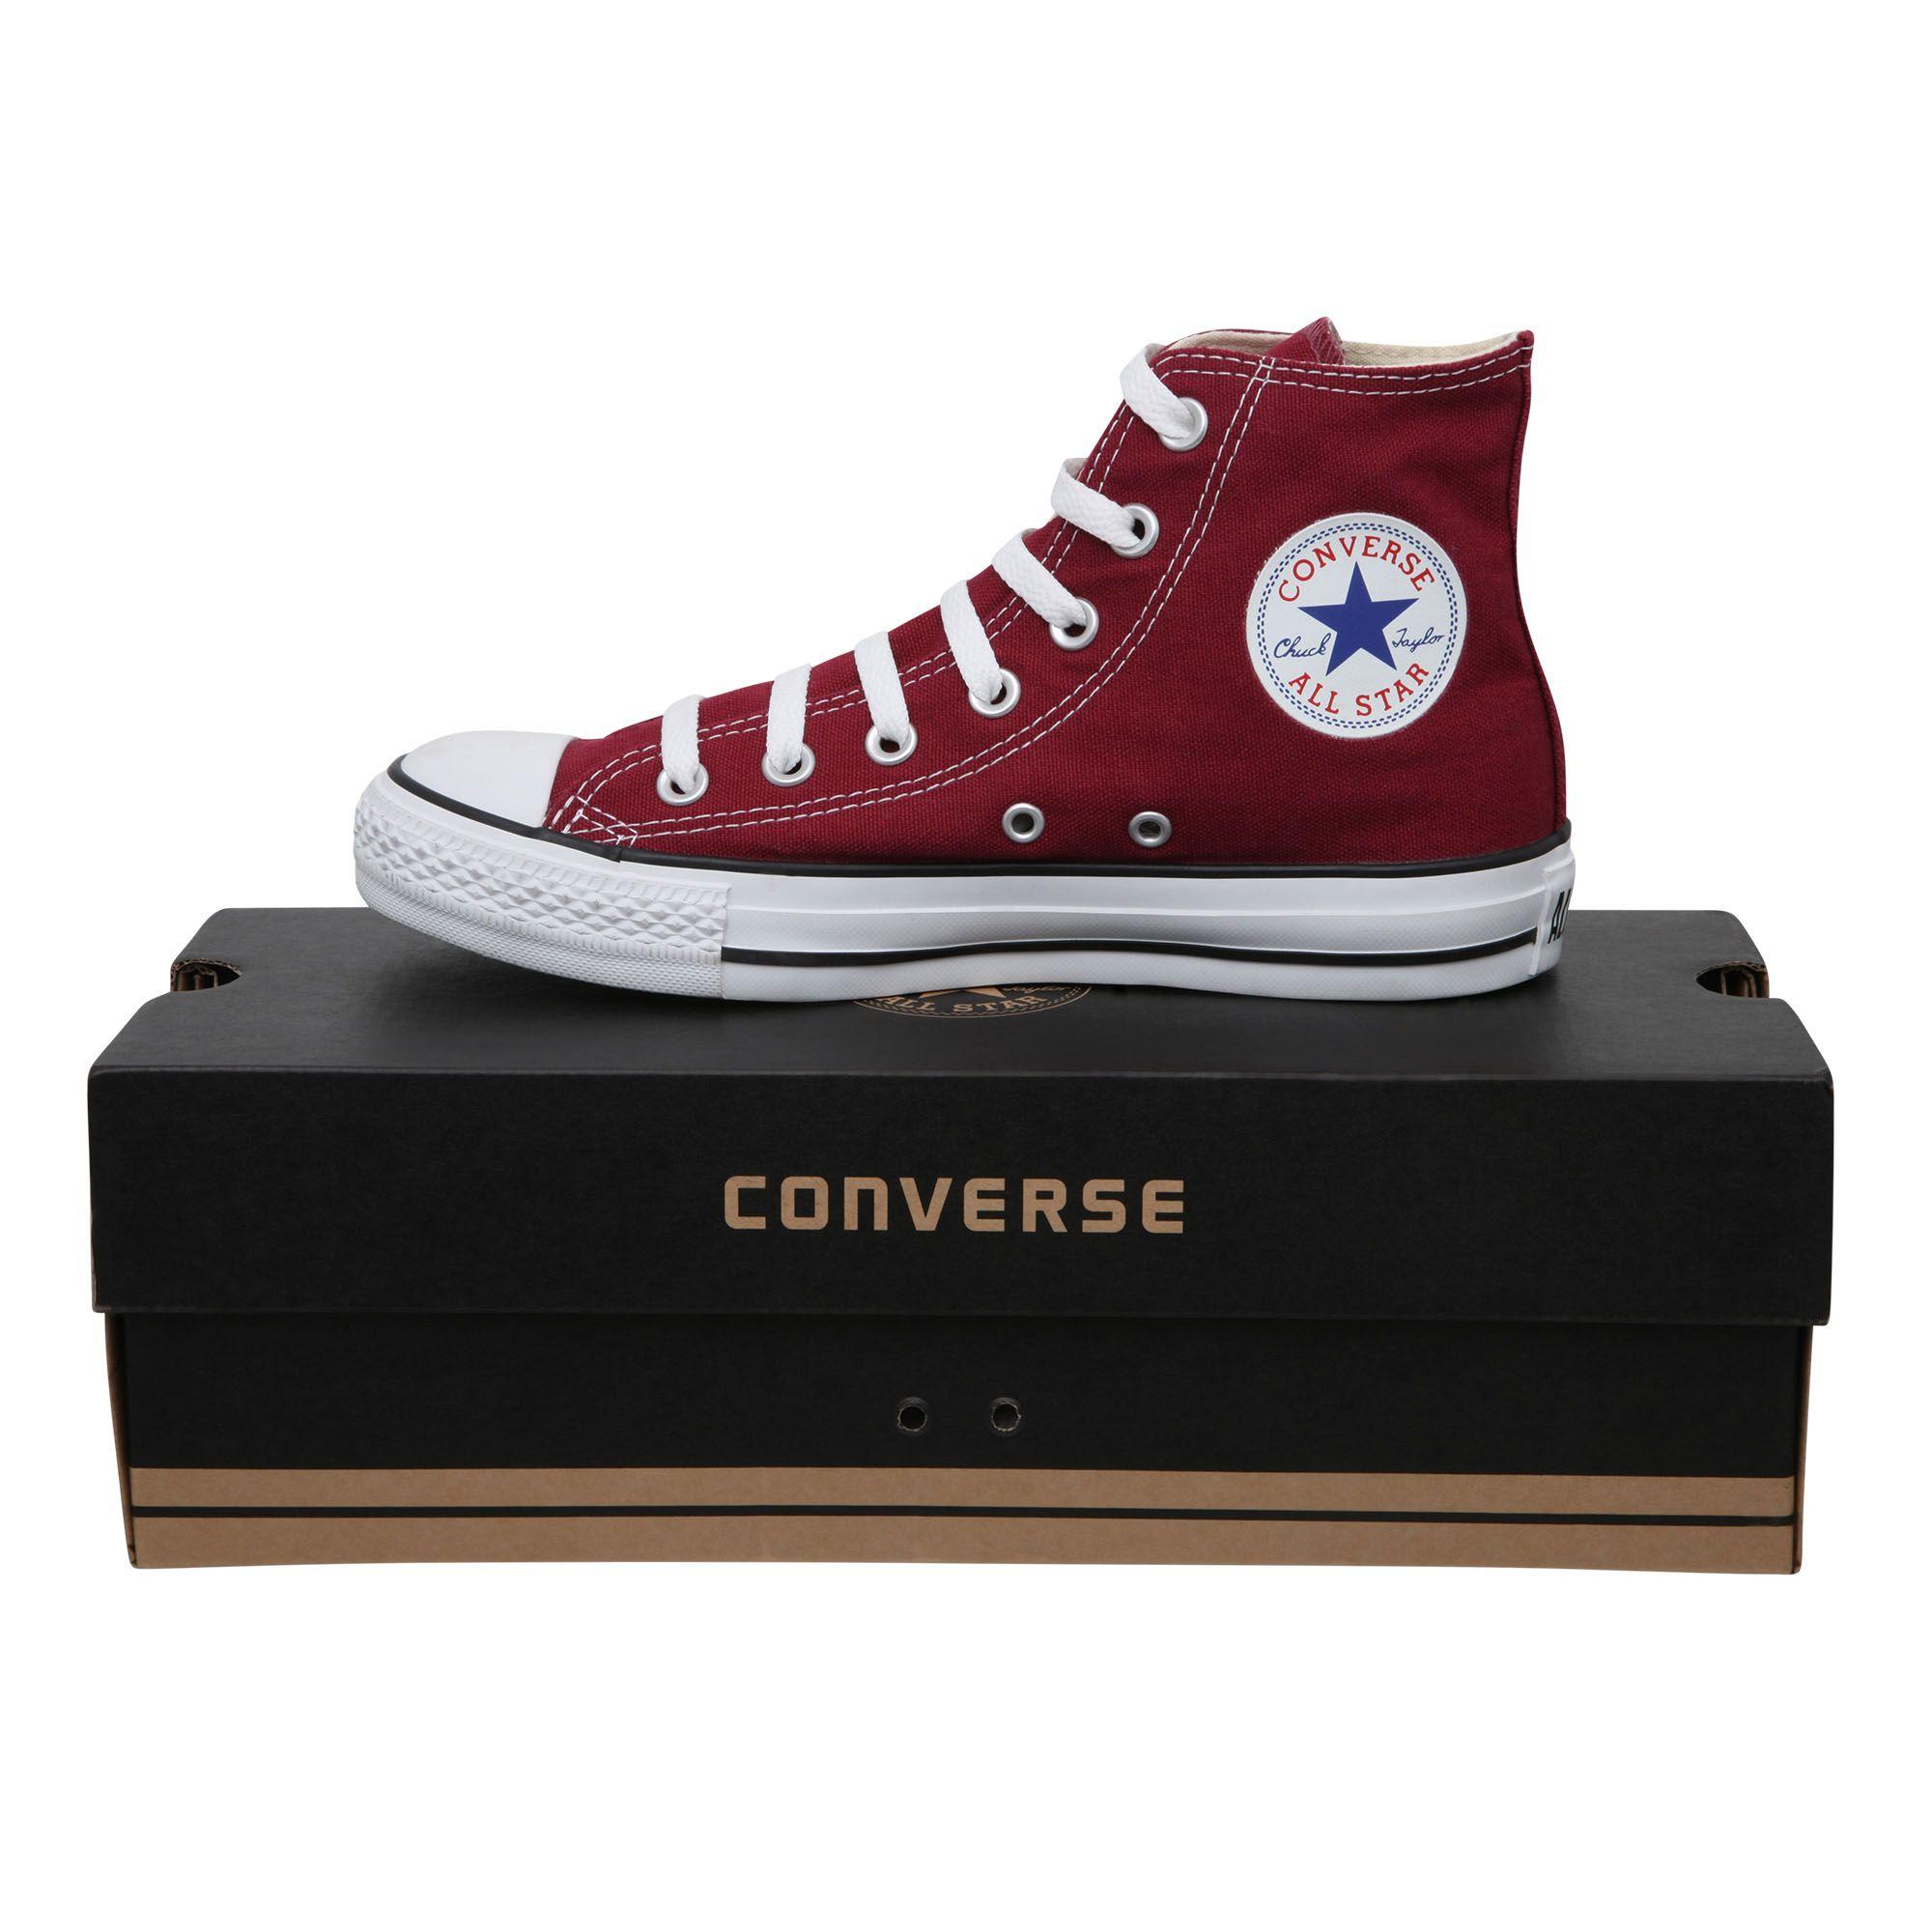 hot-seeling original new design cute cheap Converse Maroon High Top cxmail.co.uk